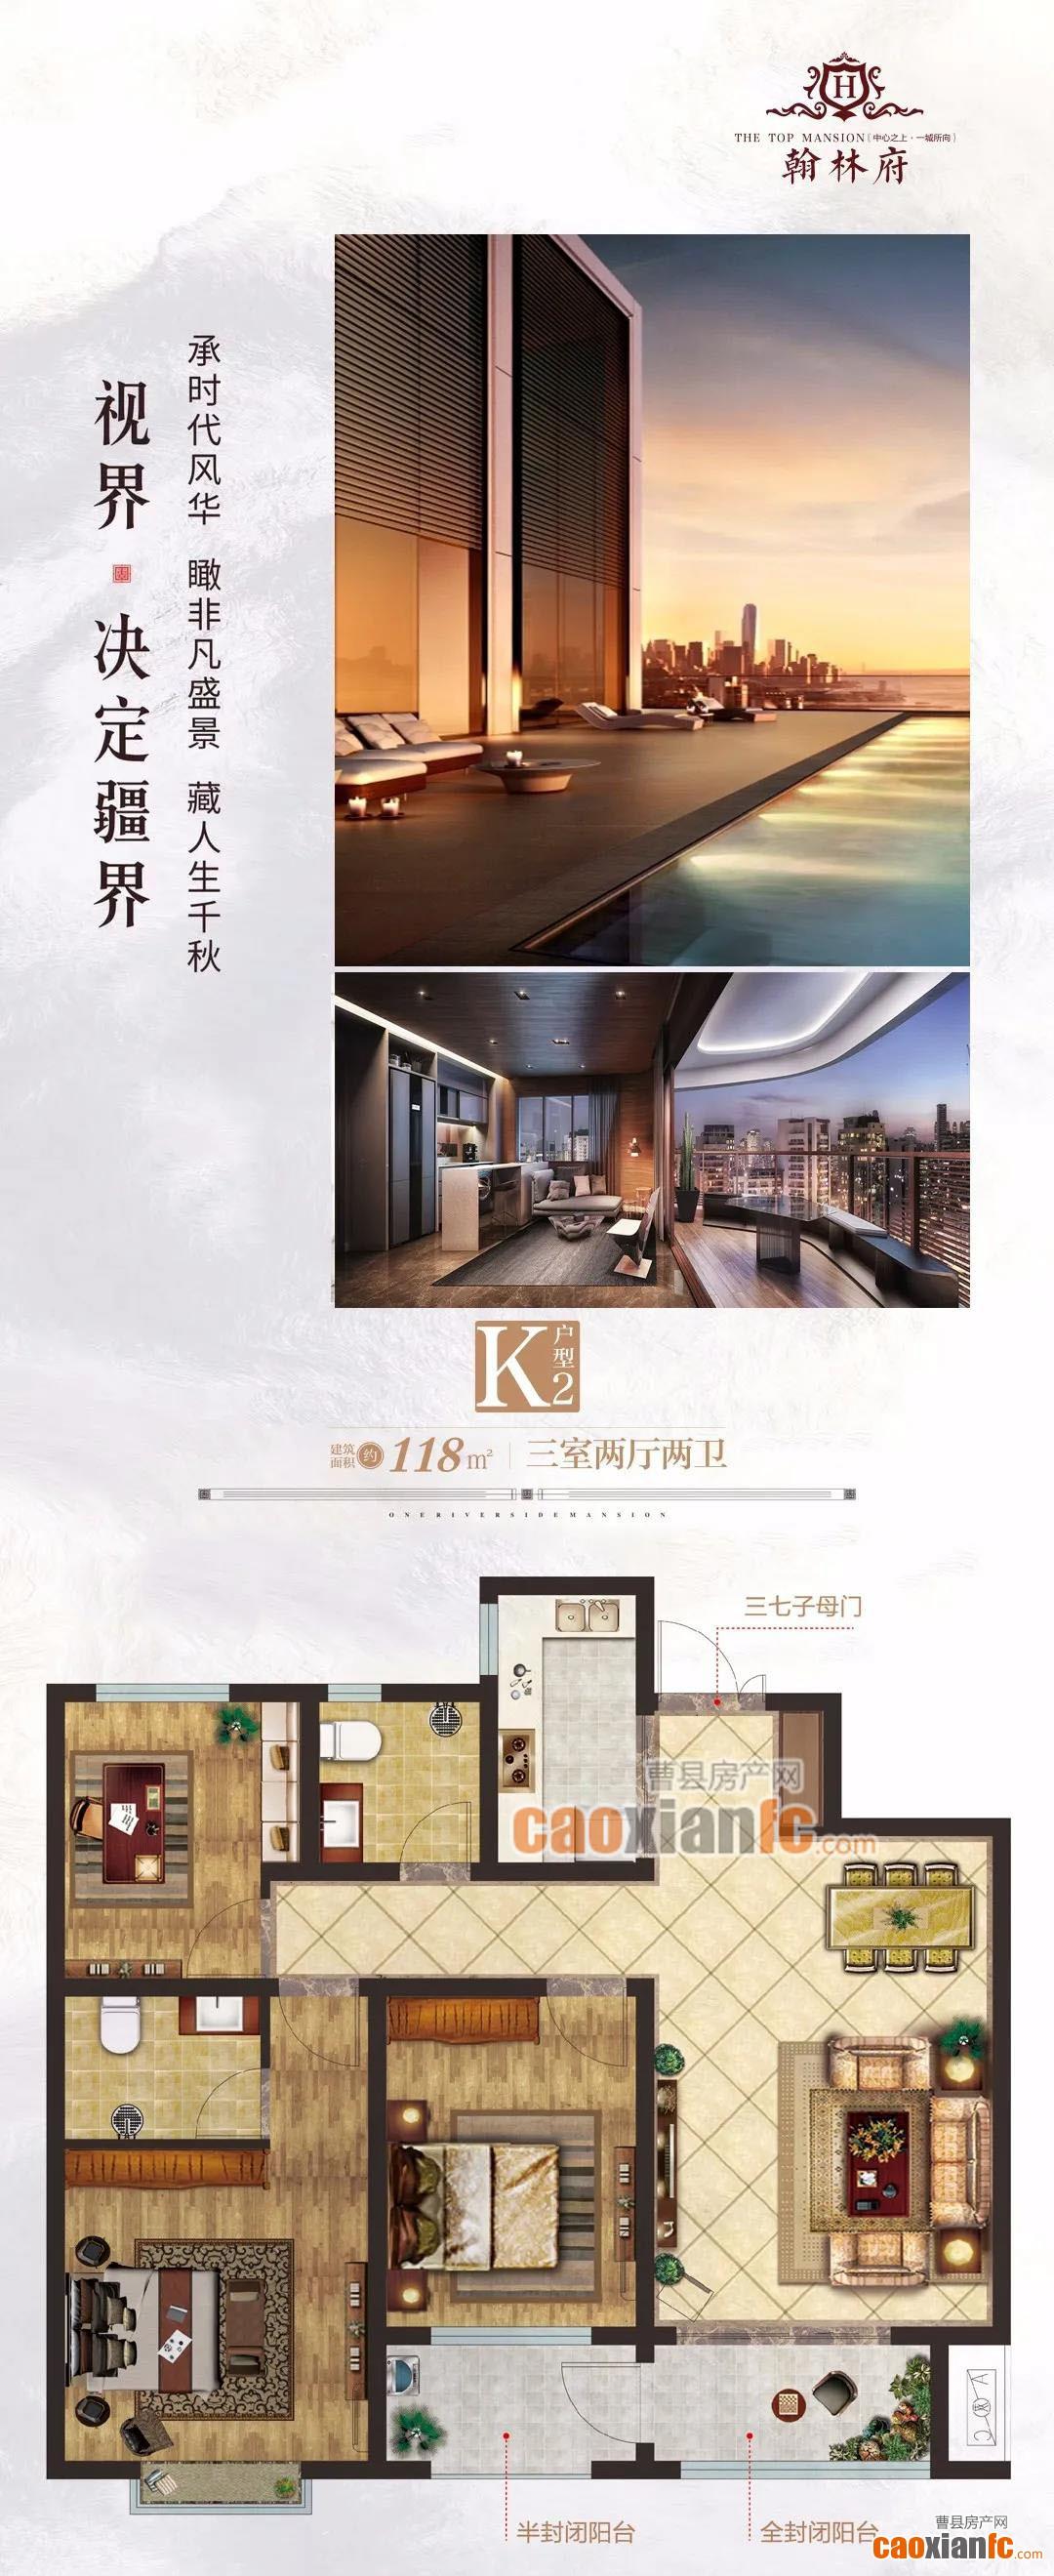 K2K2【翰林府】建面约118㎡温馨三室承载